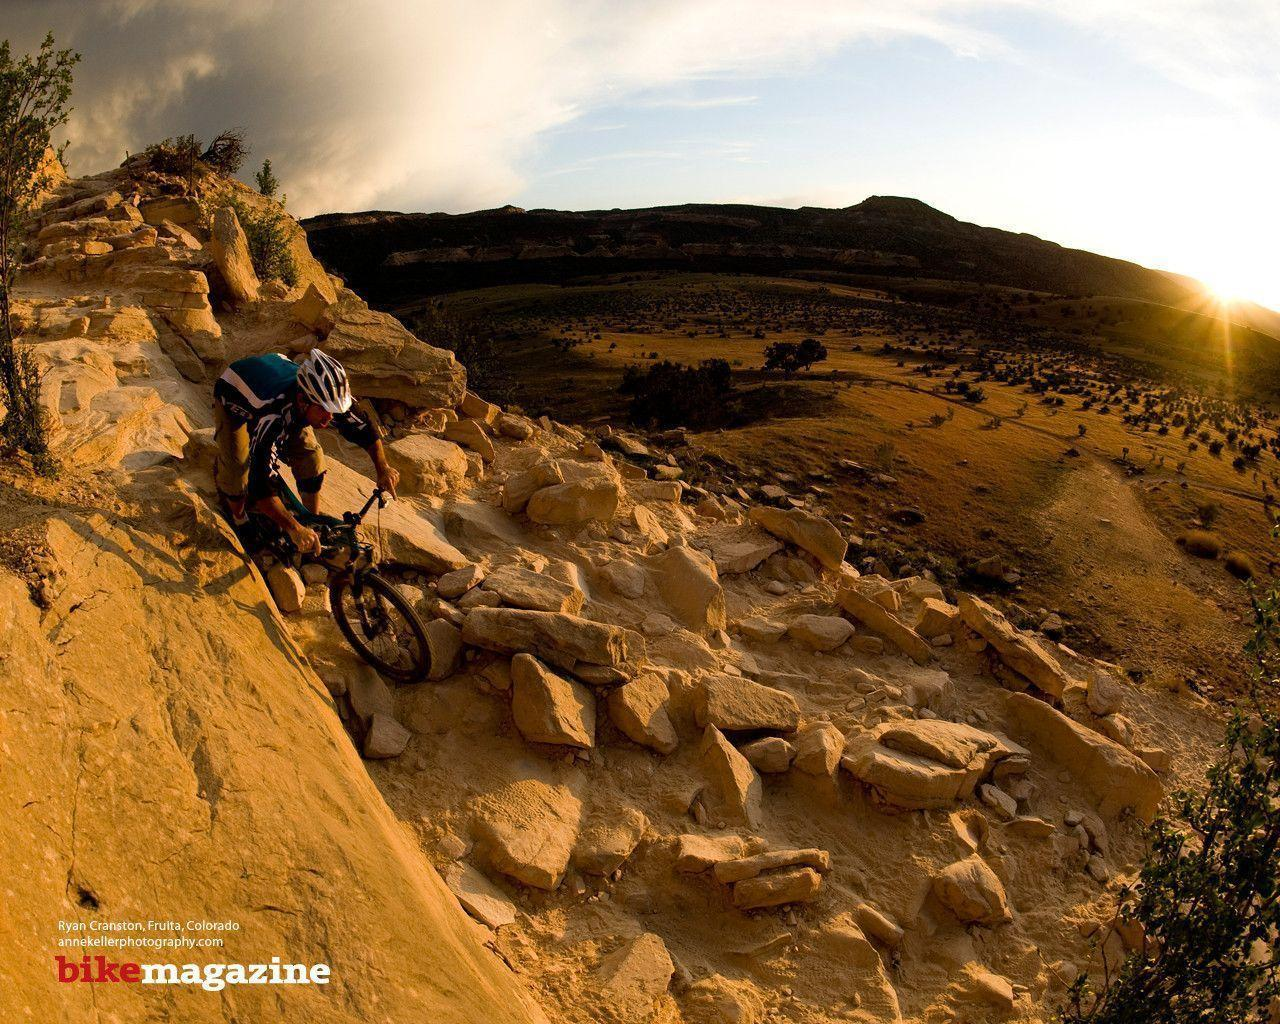 Downhill Mountain Bike Wallpaper 67 Images: Downhill Mountain Bike Wallpapers